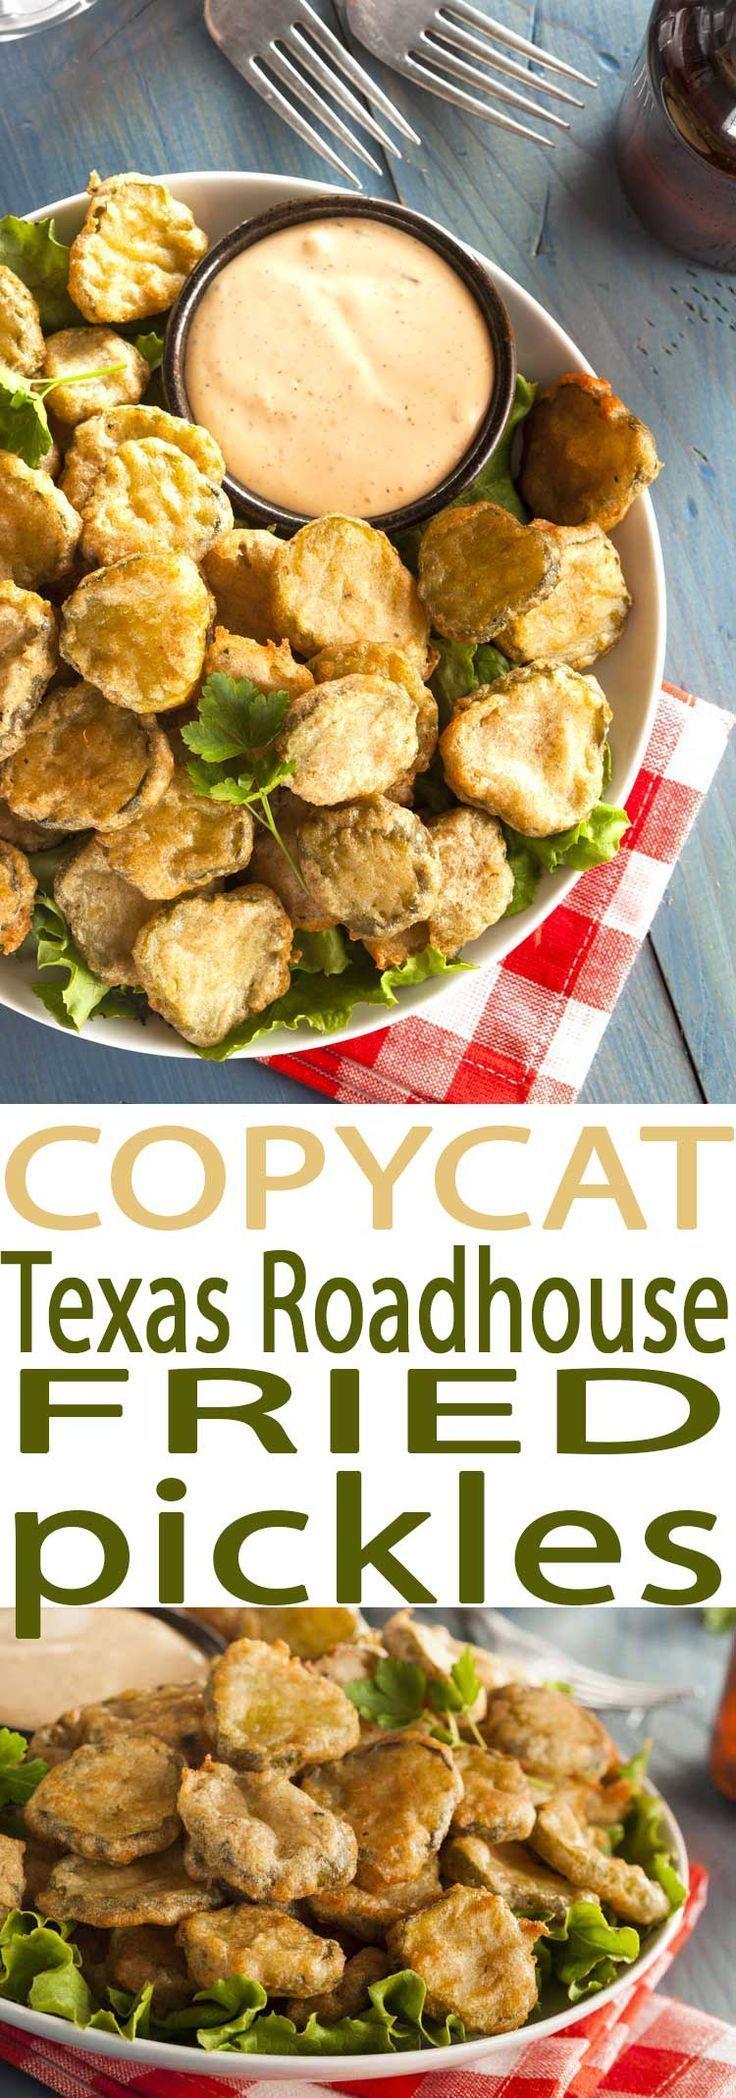 delicious fried pickles recipes copycat